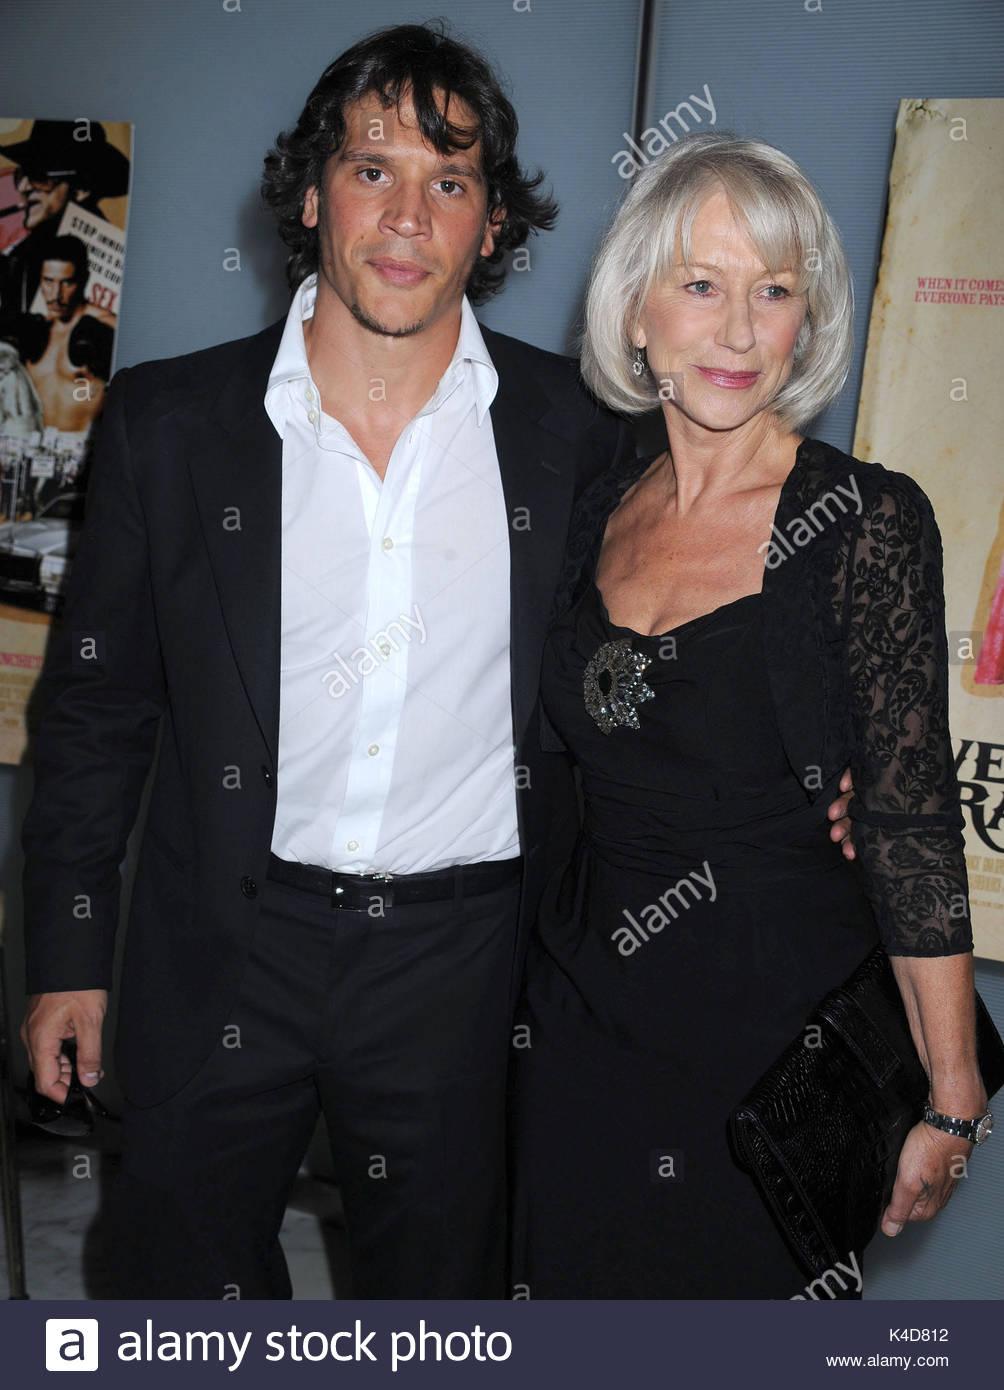 Sergio Peris Mencheta And Helen Mirren Nyc Premiere Of Love Ranch